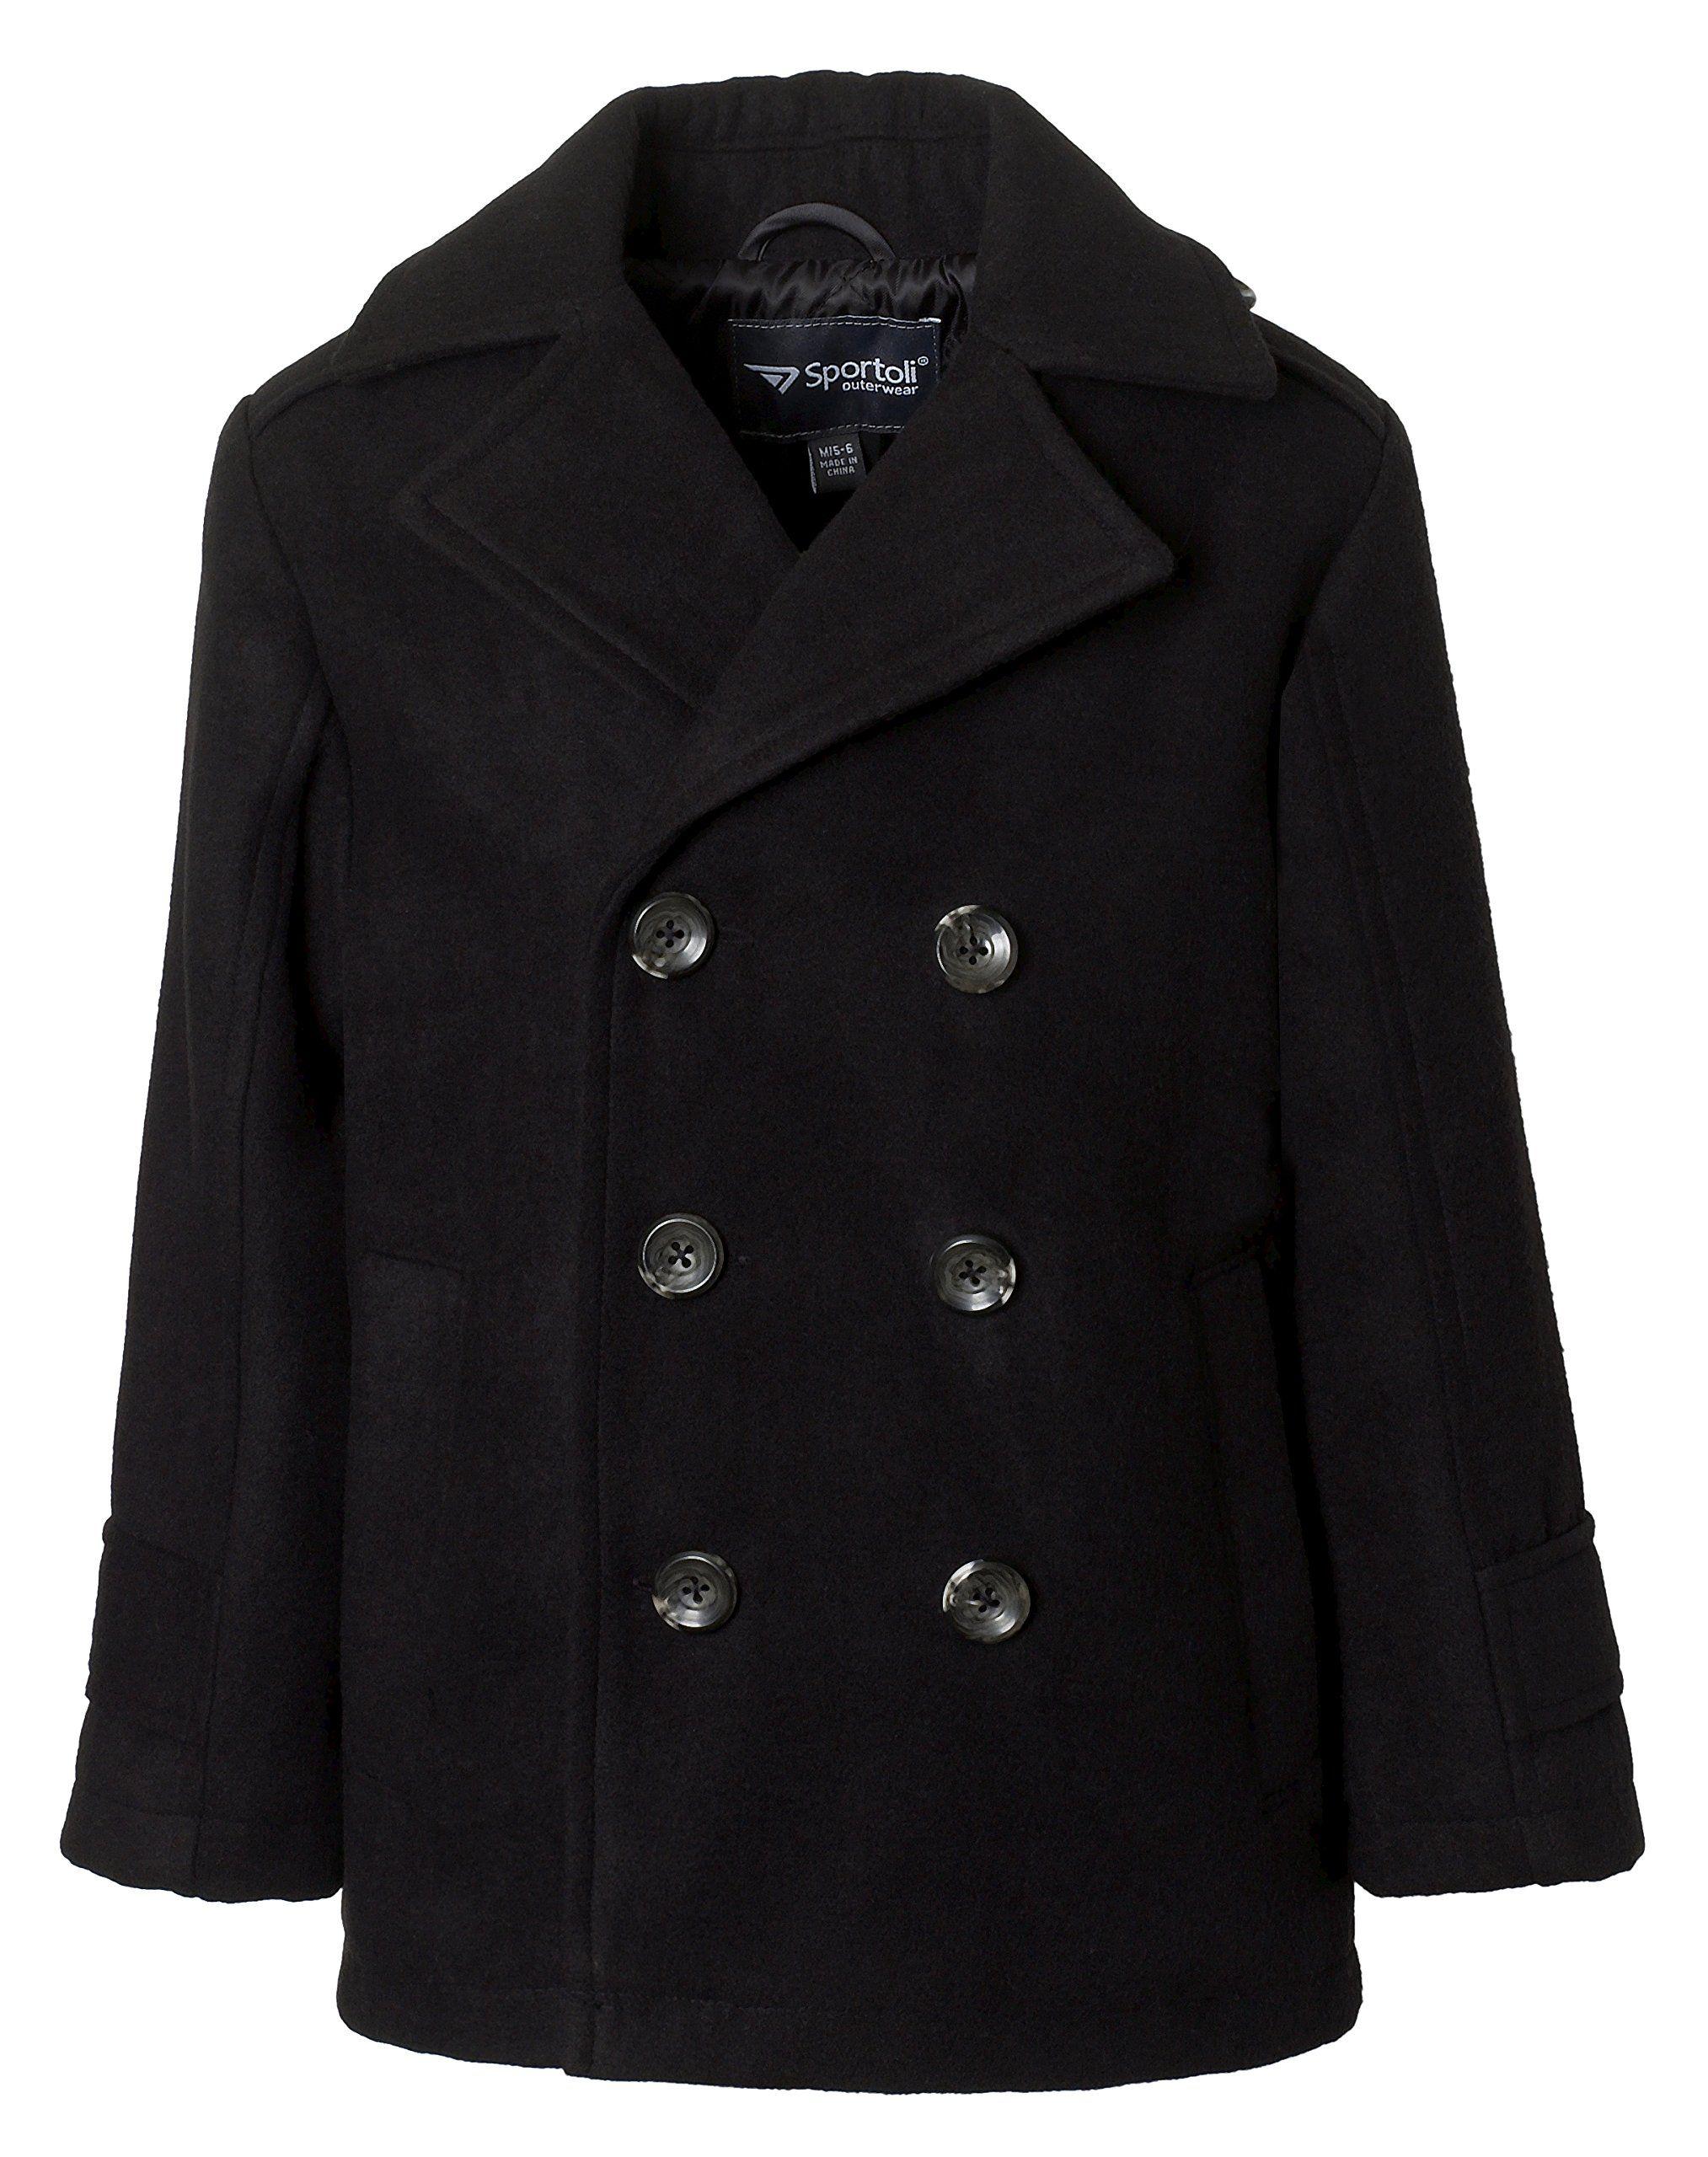 8aab2d46135b Sportoli Boys Classic Wool Look Quilt Lined Winter Dress Pea Coat ...